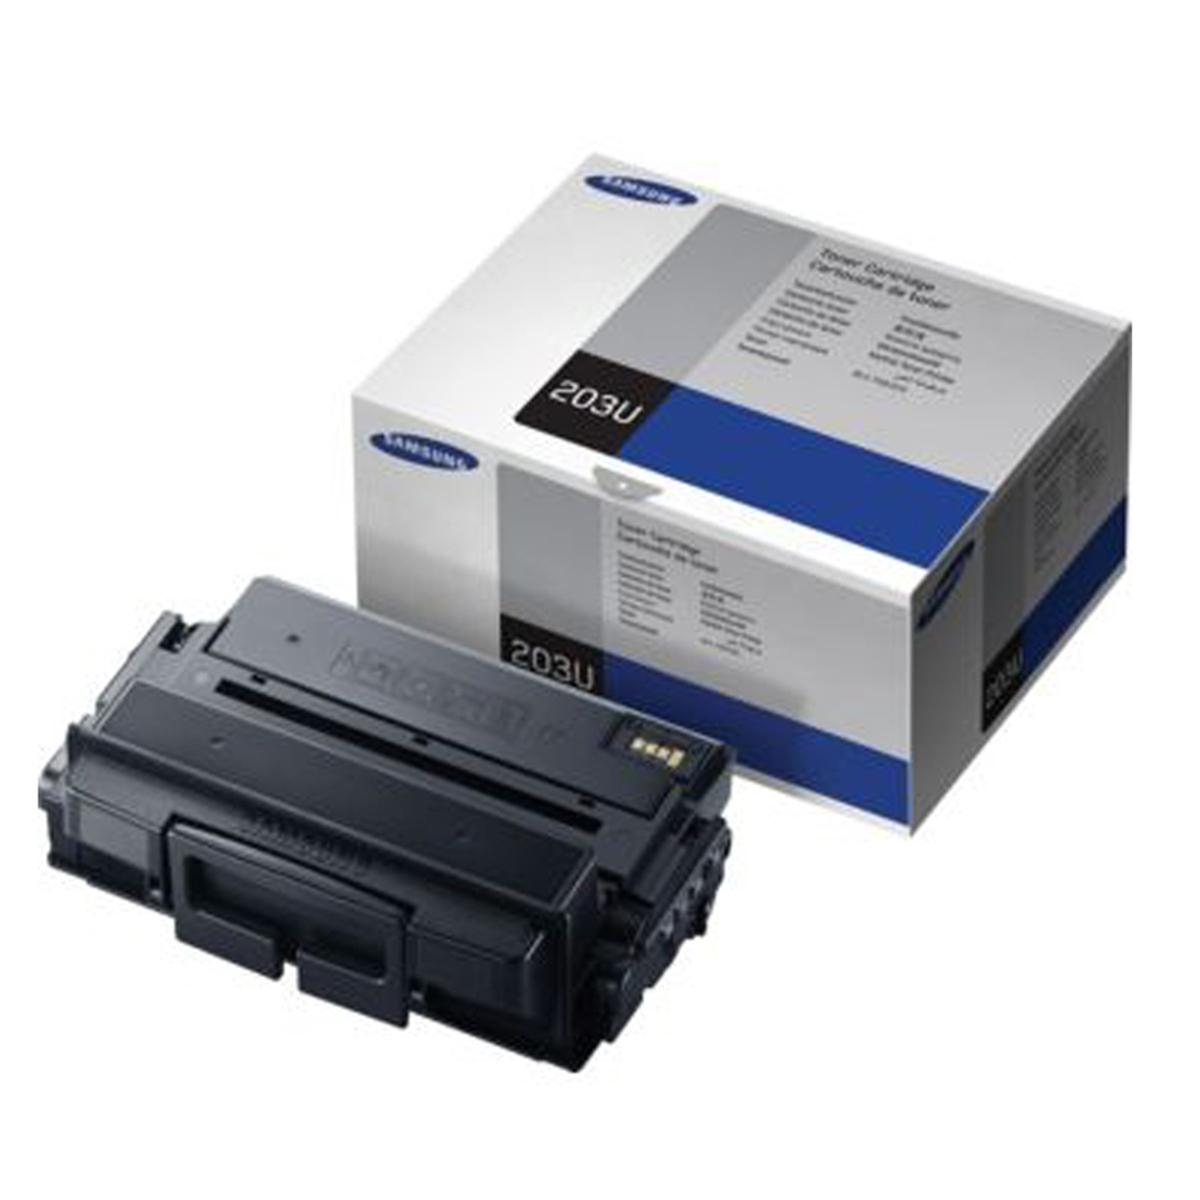 Cartus Toner Samsung MLT-P203U Black